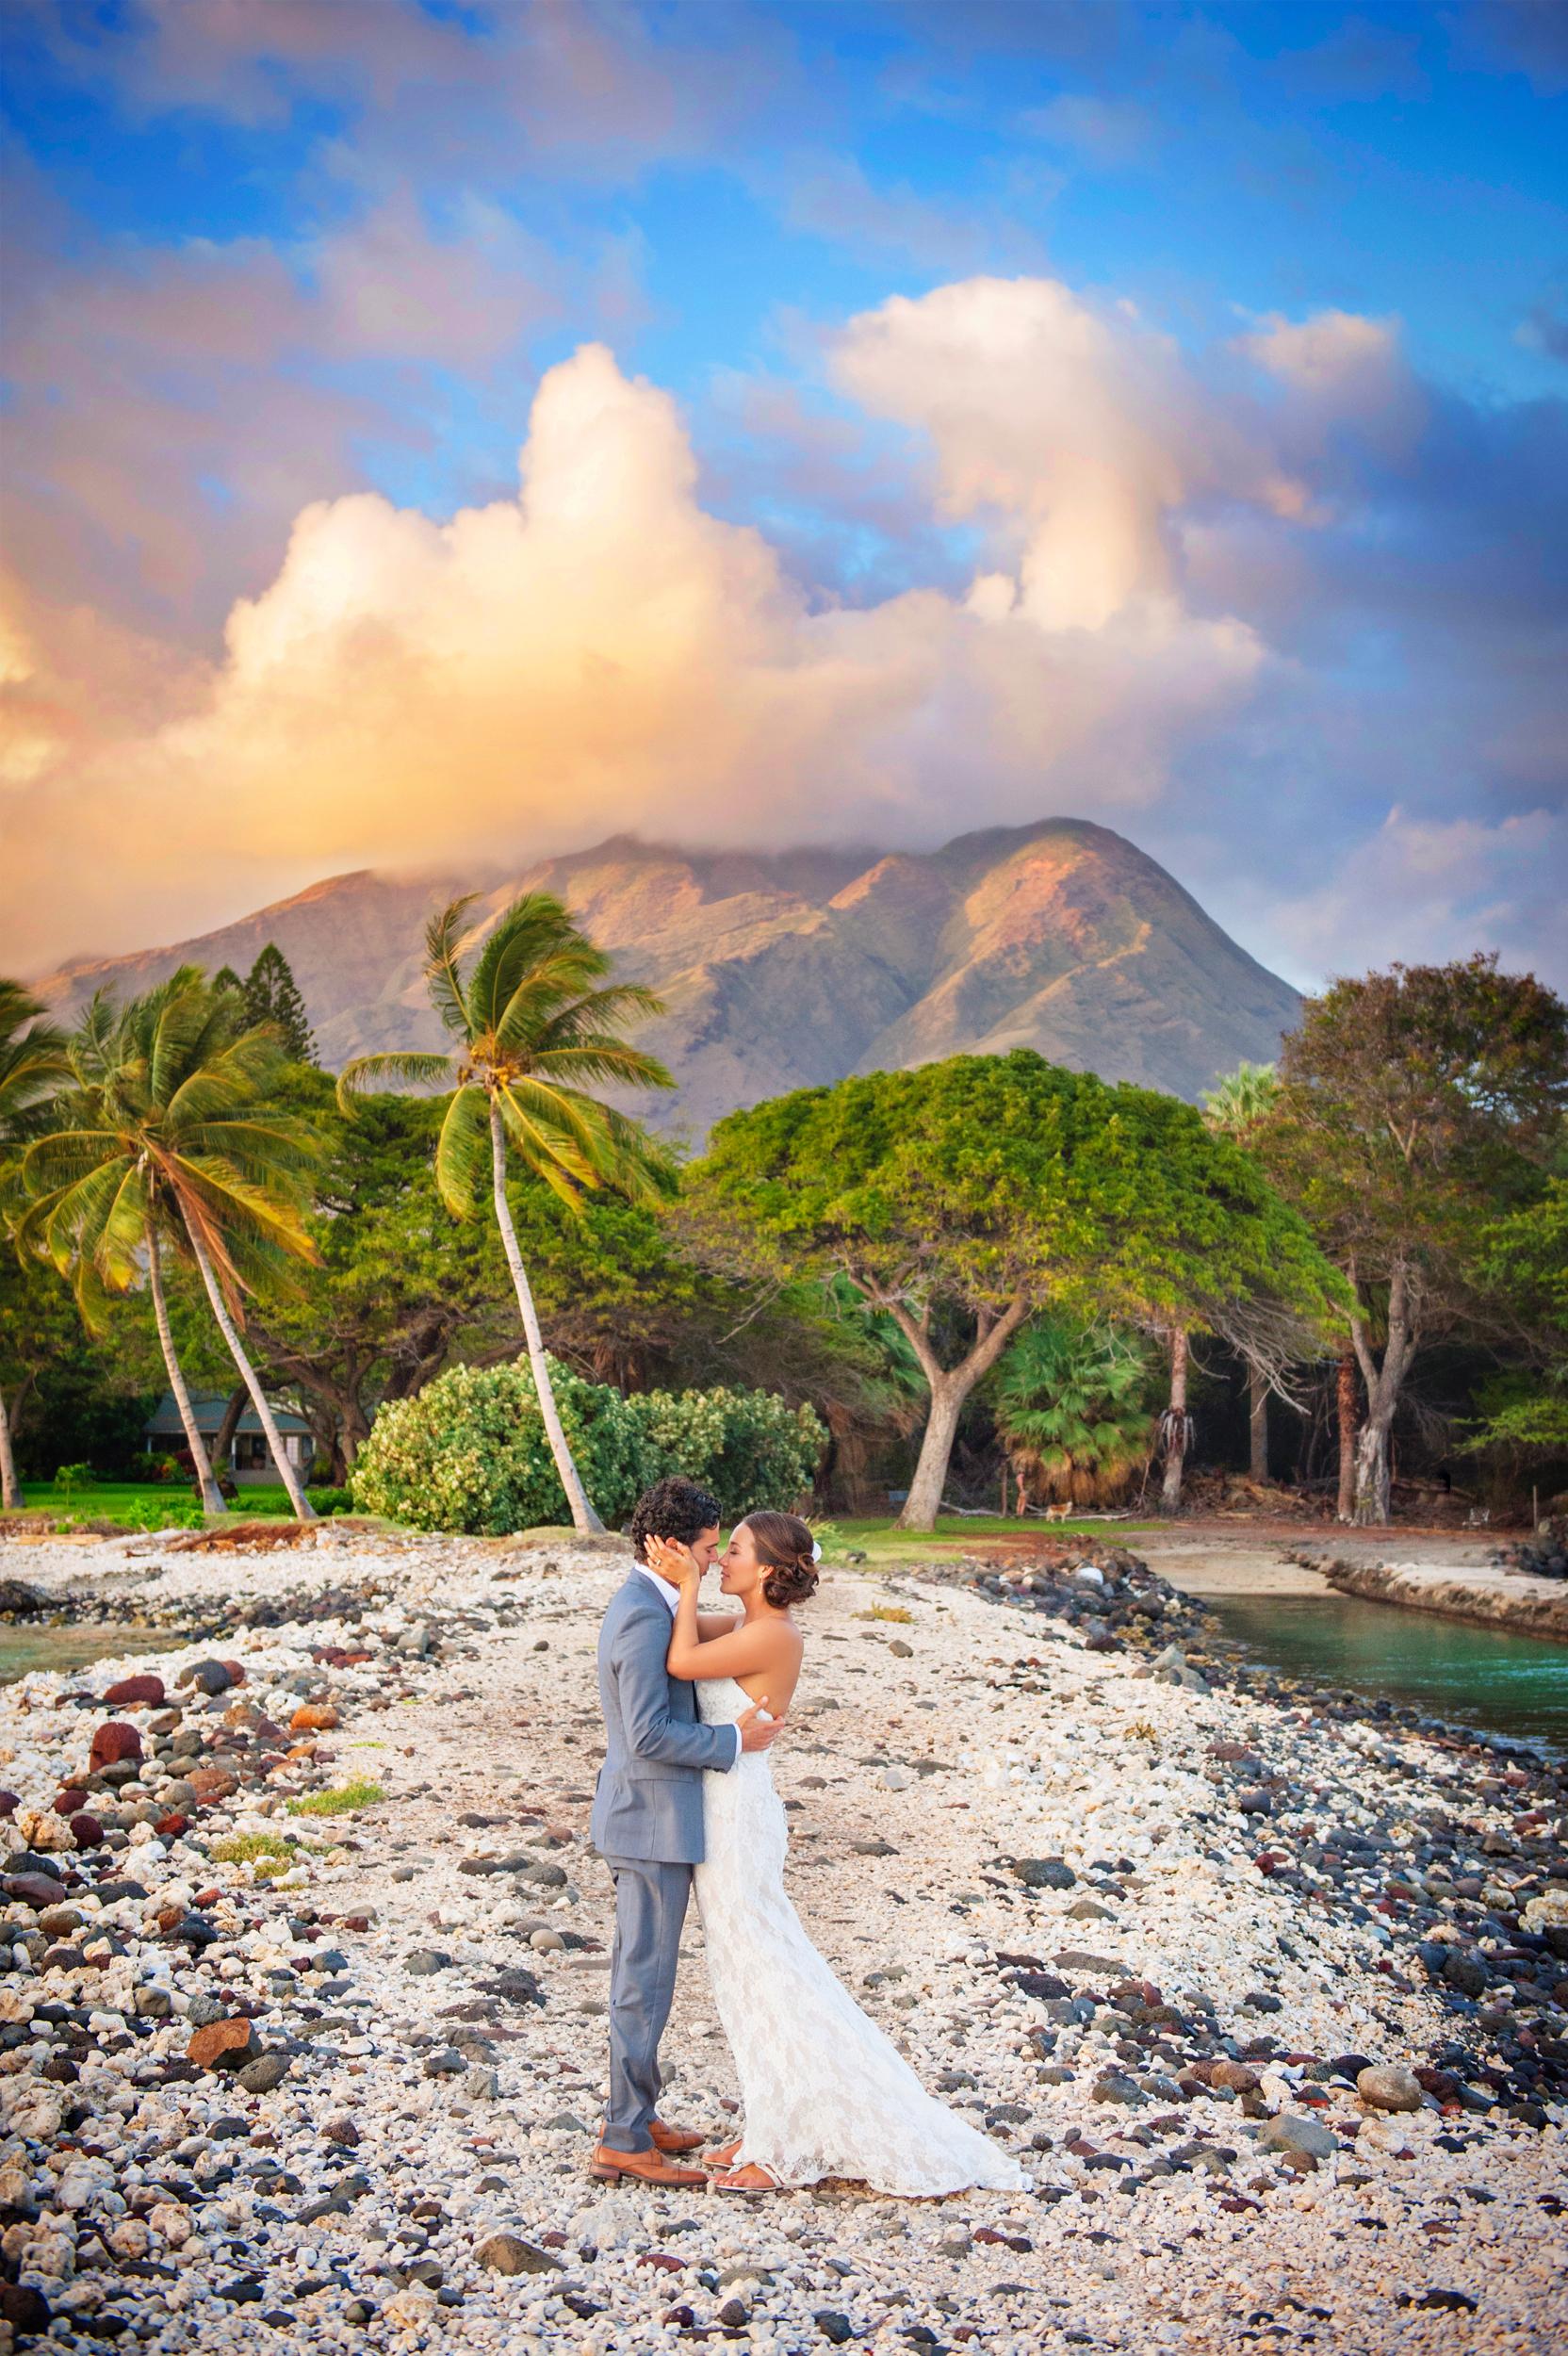 JKP-Destination-Weddings-0002.JPG